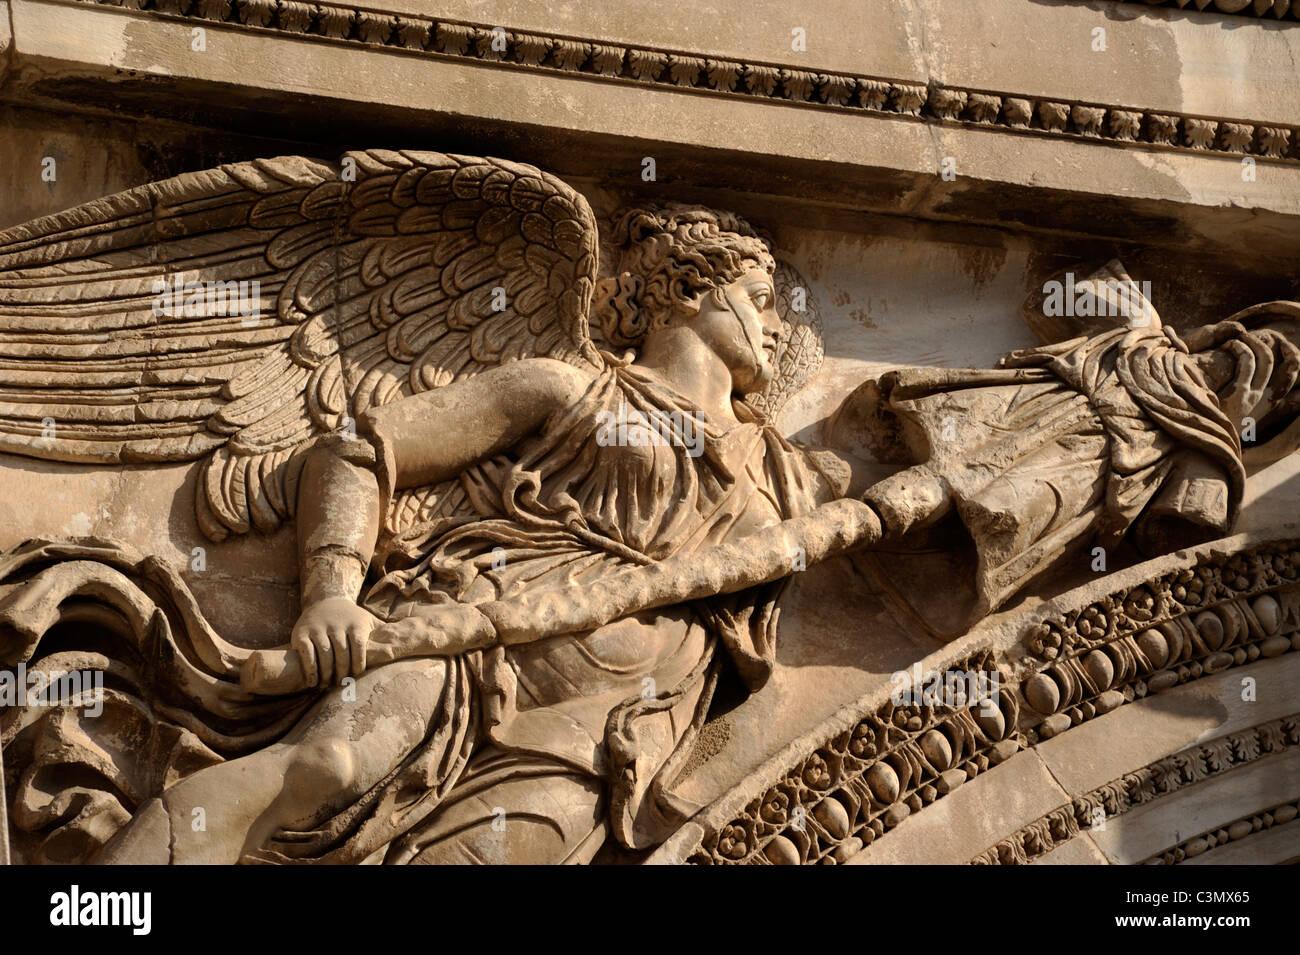 italy, rome, roman forum, arch of septimius severus, bas relief detail - Stock Image